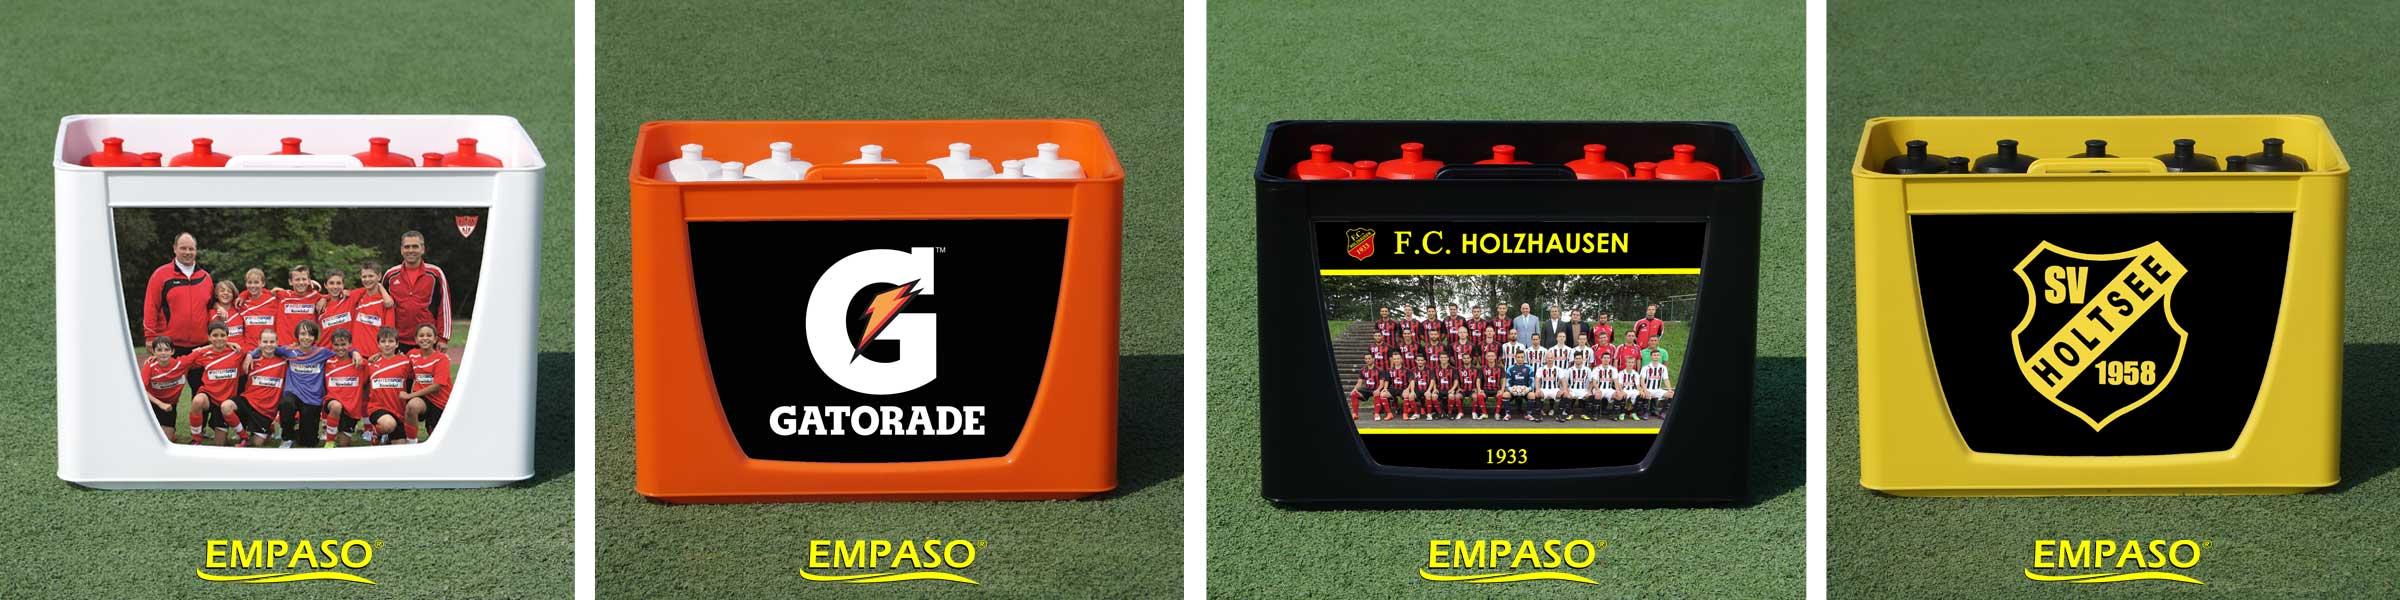 EMPASO TeamKiste - 12er Flaschenträger Set